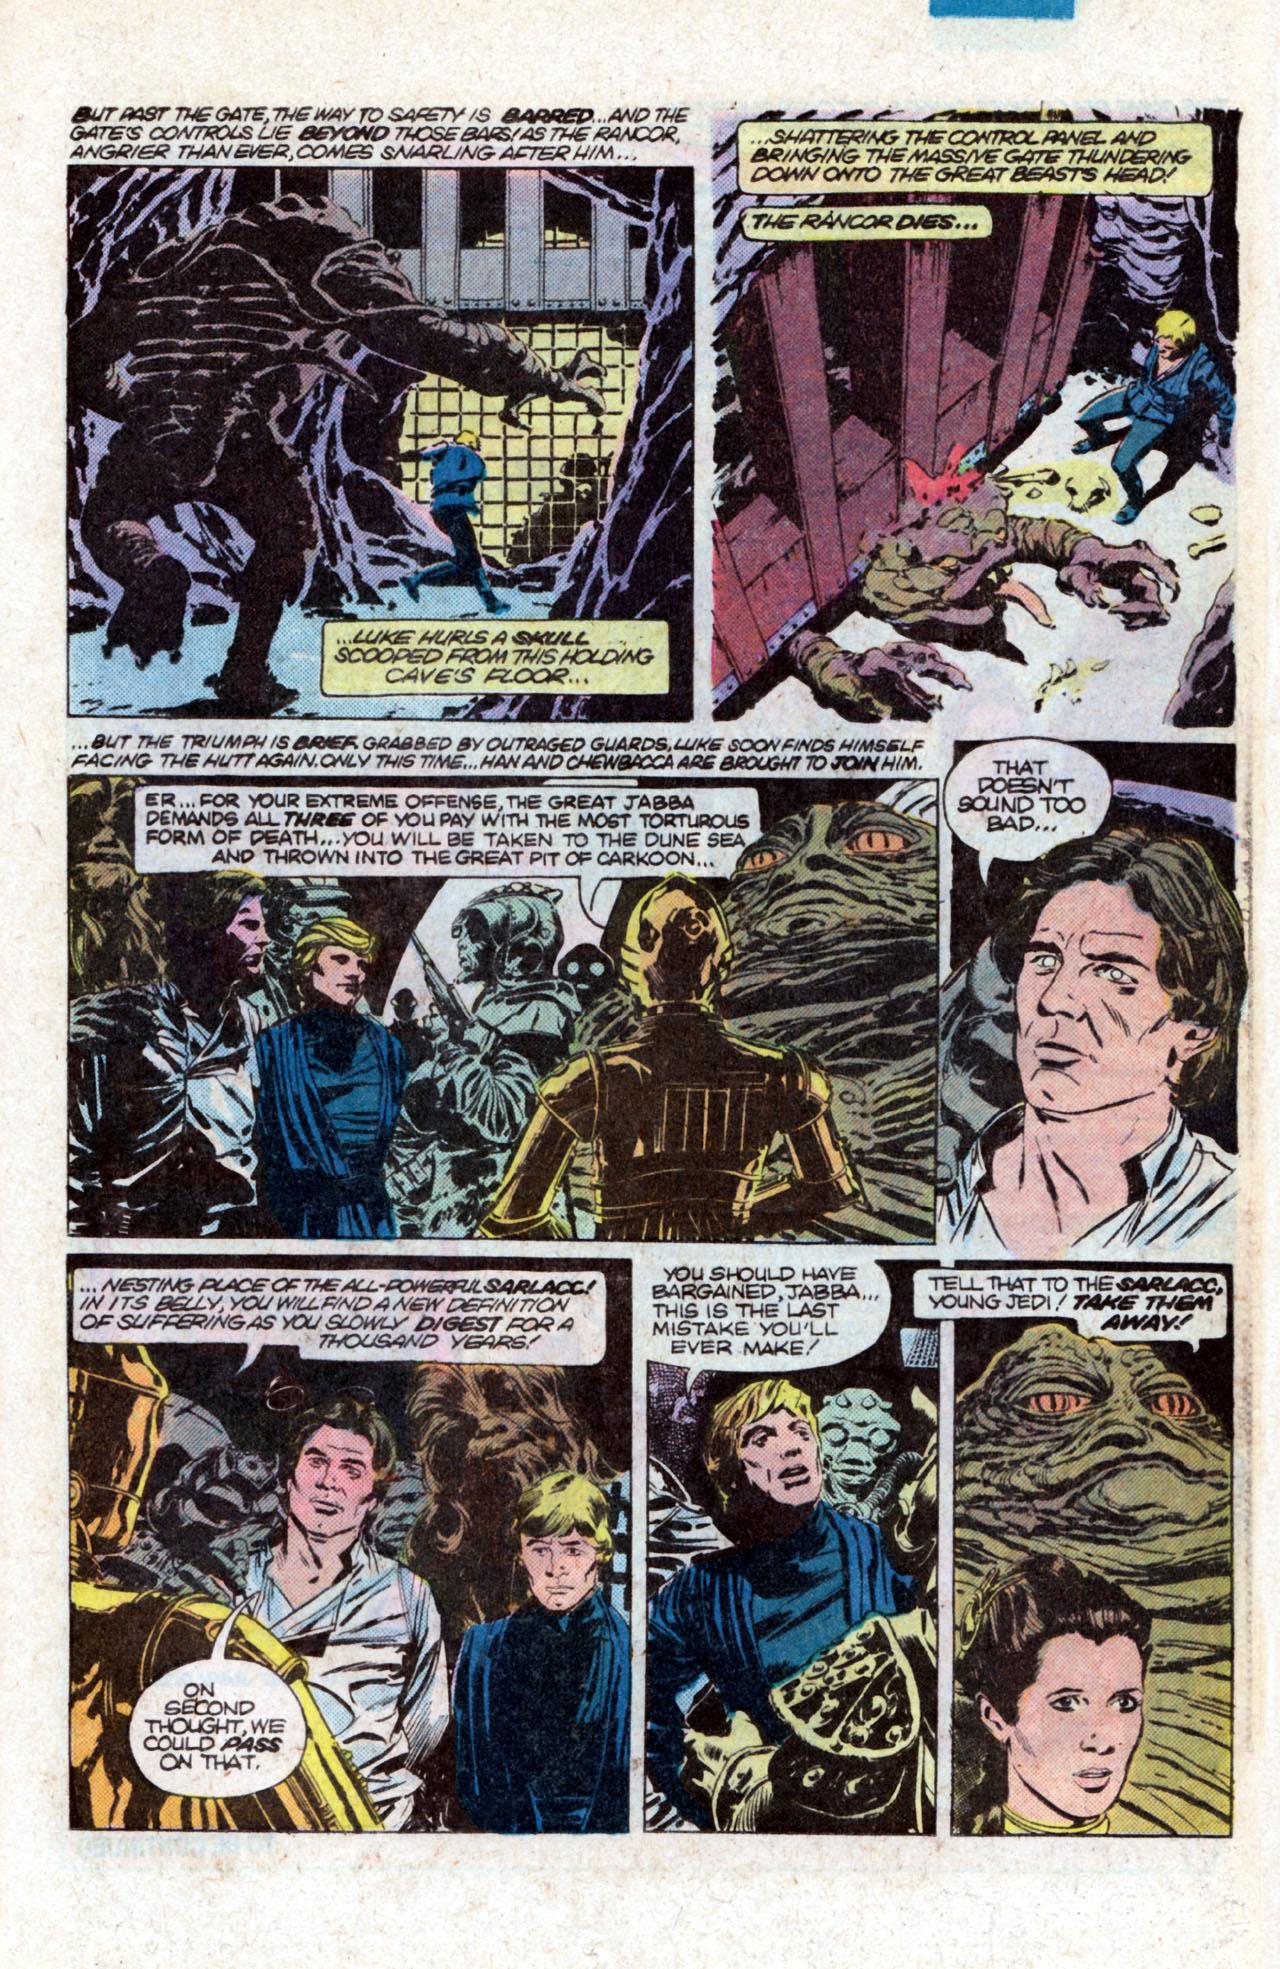 Read online Star Wars: Return of the Jedi comic -  Issue #1 - 24